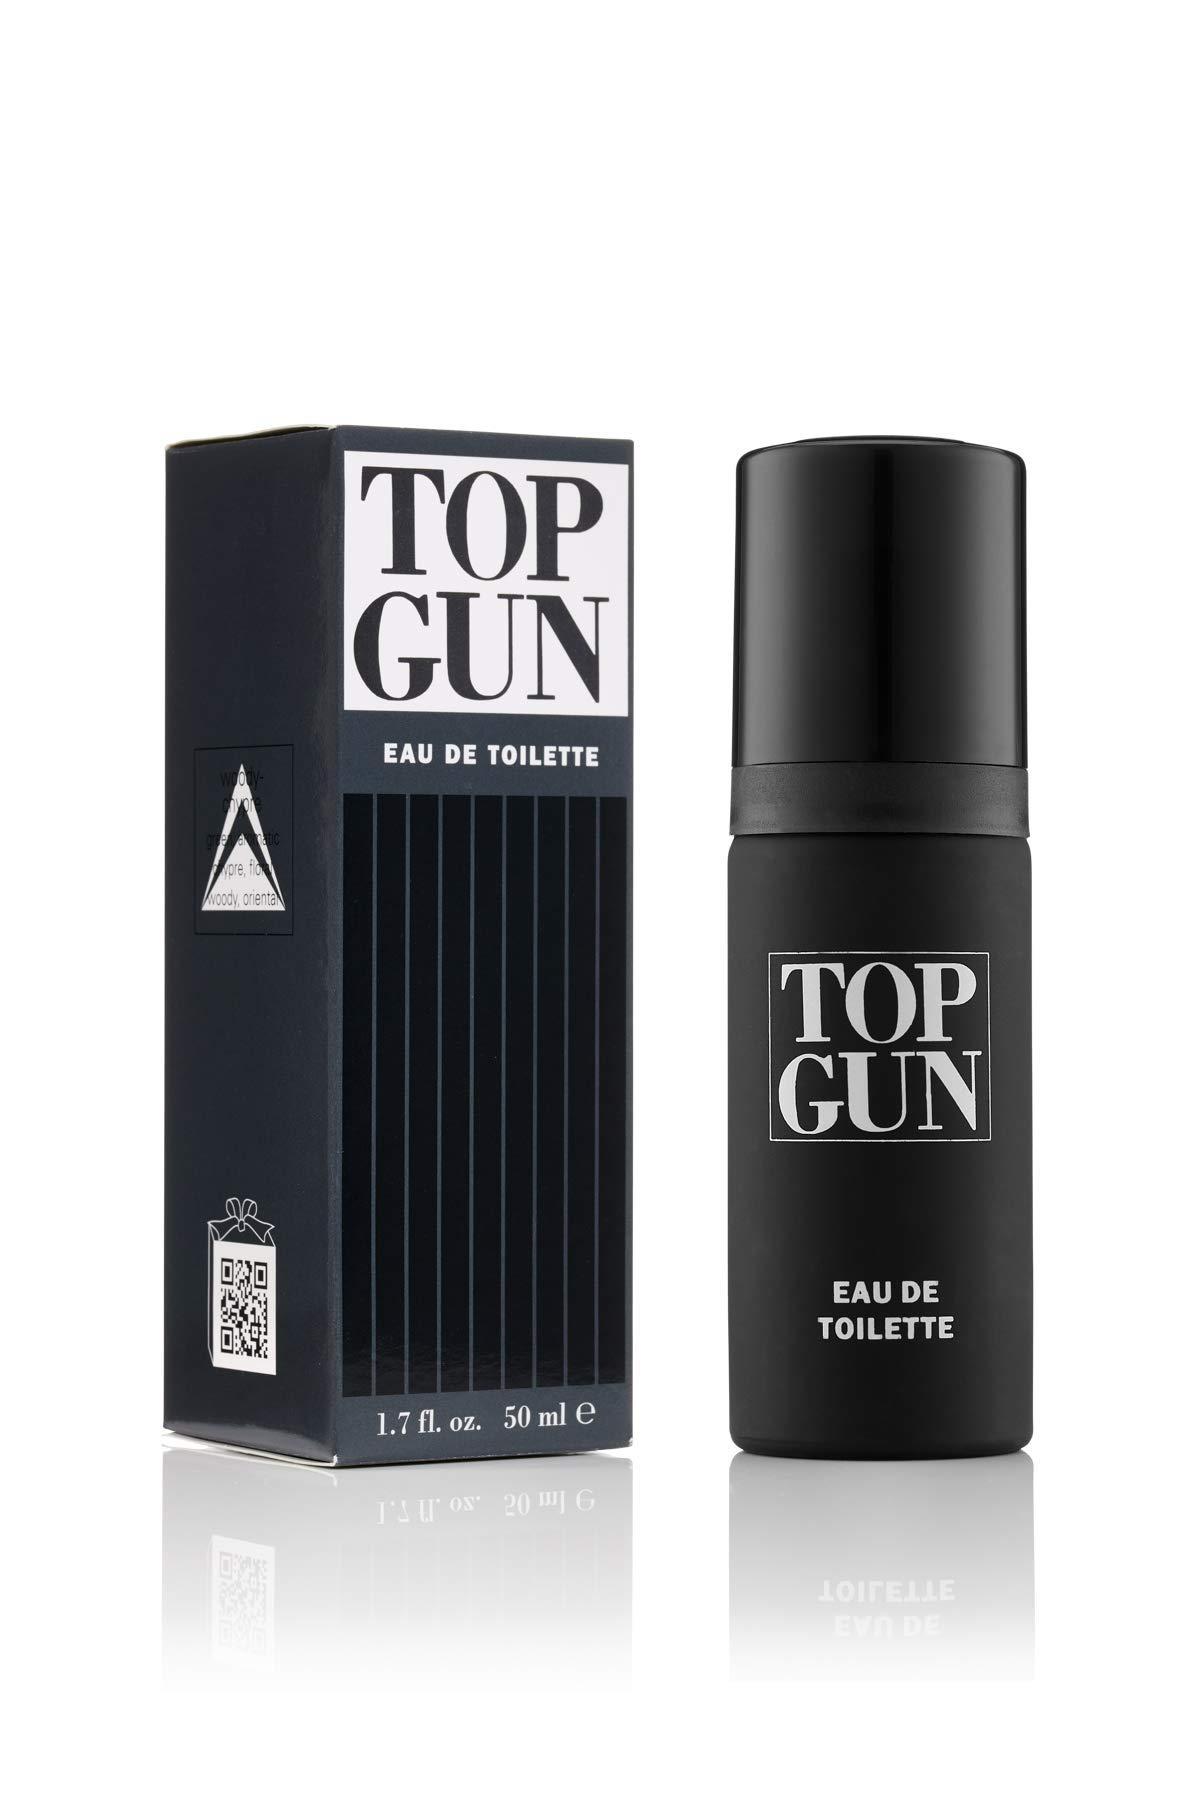 Milton-Lloyd Top Gun - Fragrance for Men - 50ml Eau de Toilette